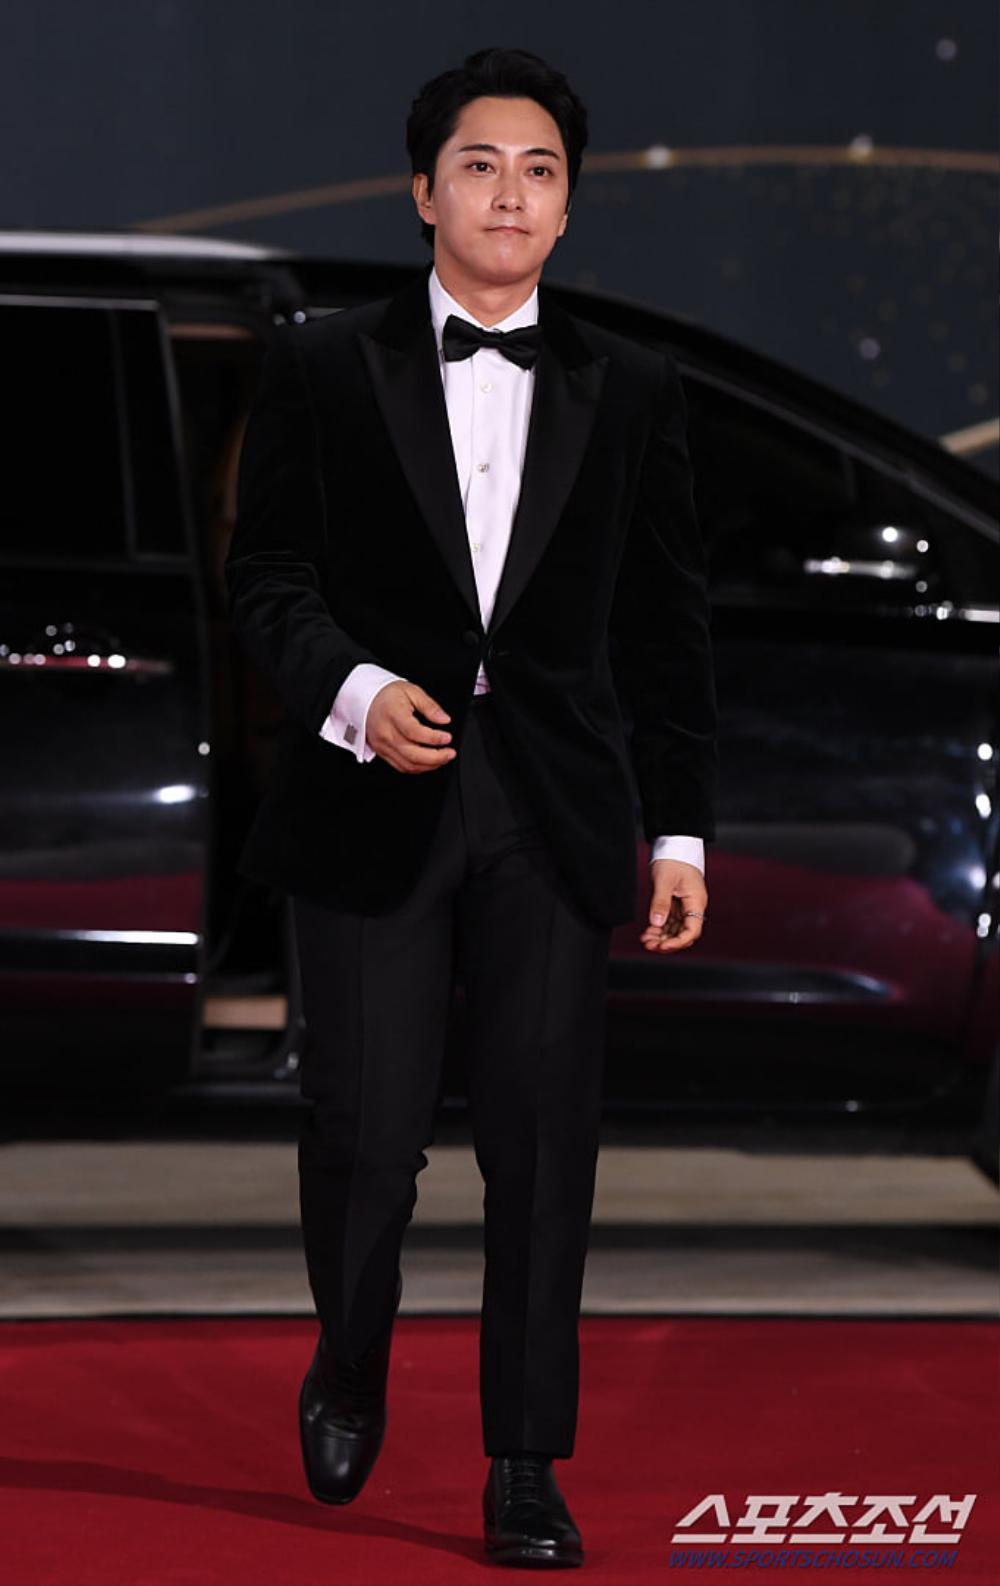 Thảm đỏ 'Rồng xanh 2020': Shin Hye Sun 'cân sắc' Shin Min Ah, Jung Woo Sung - Lee Byung Hun điển trai! Ảnh 32